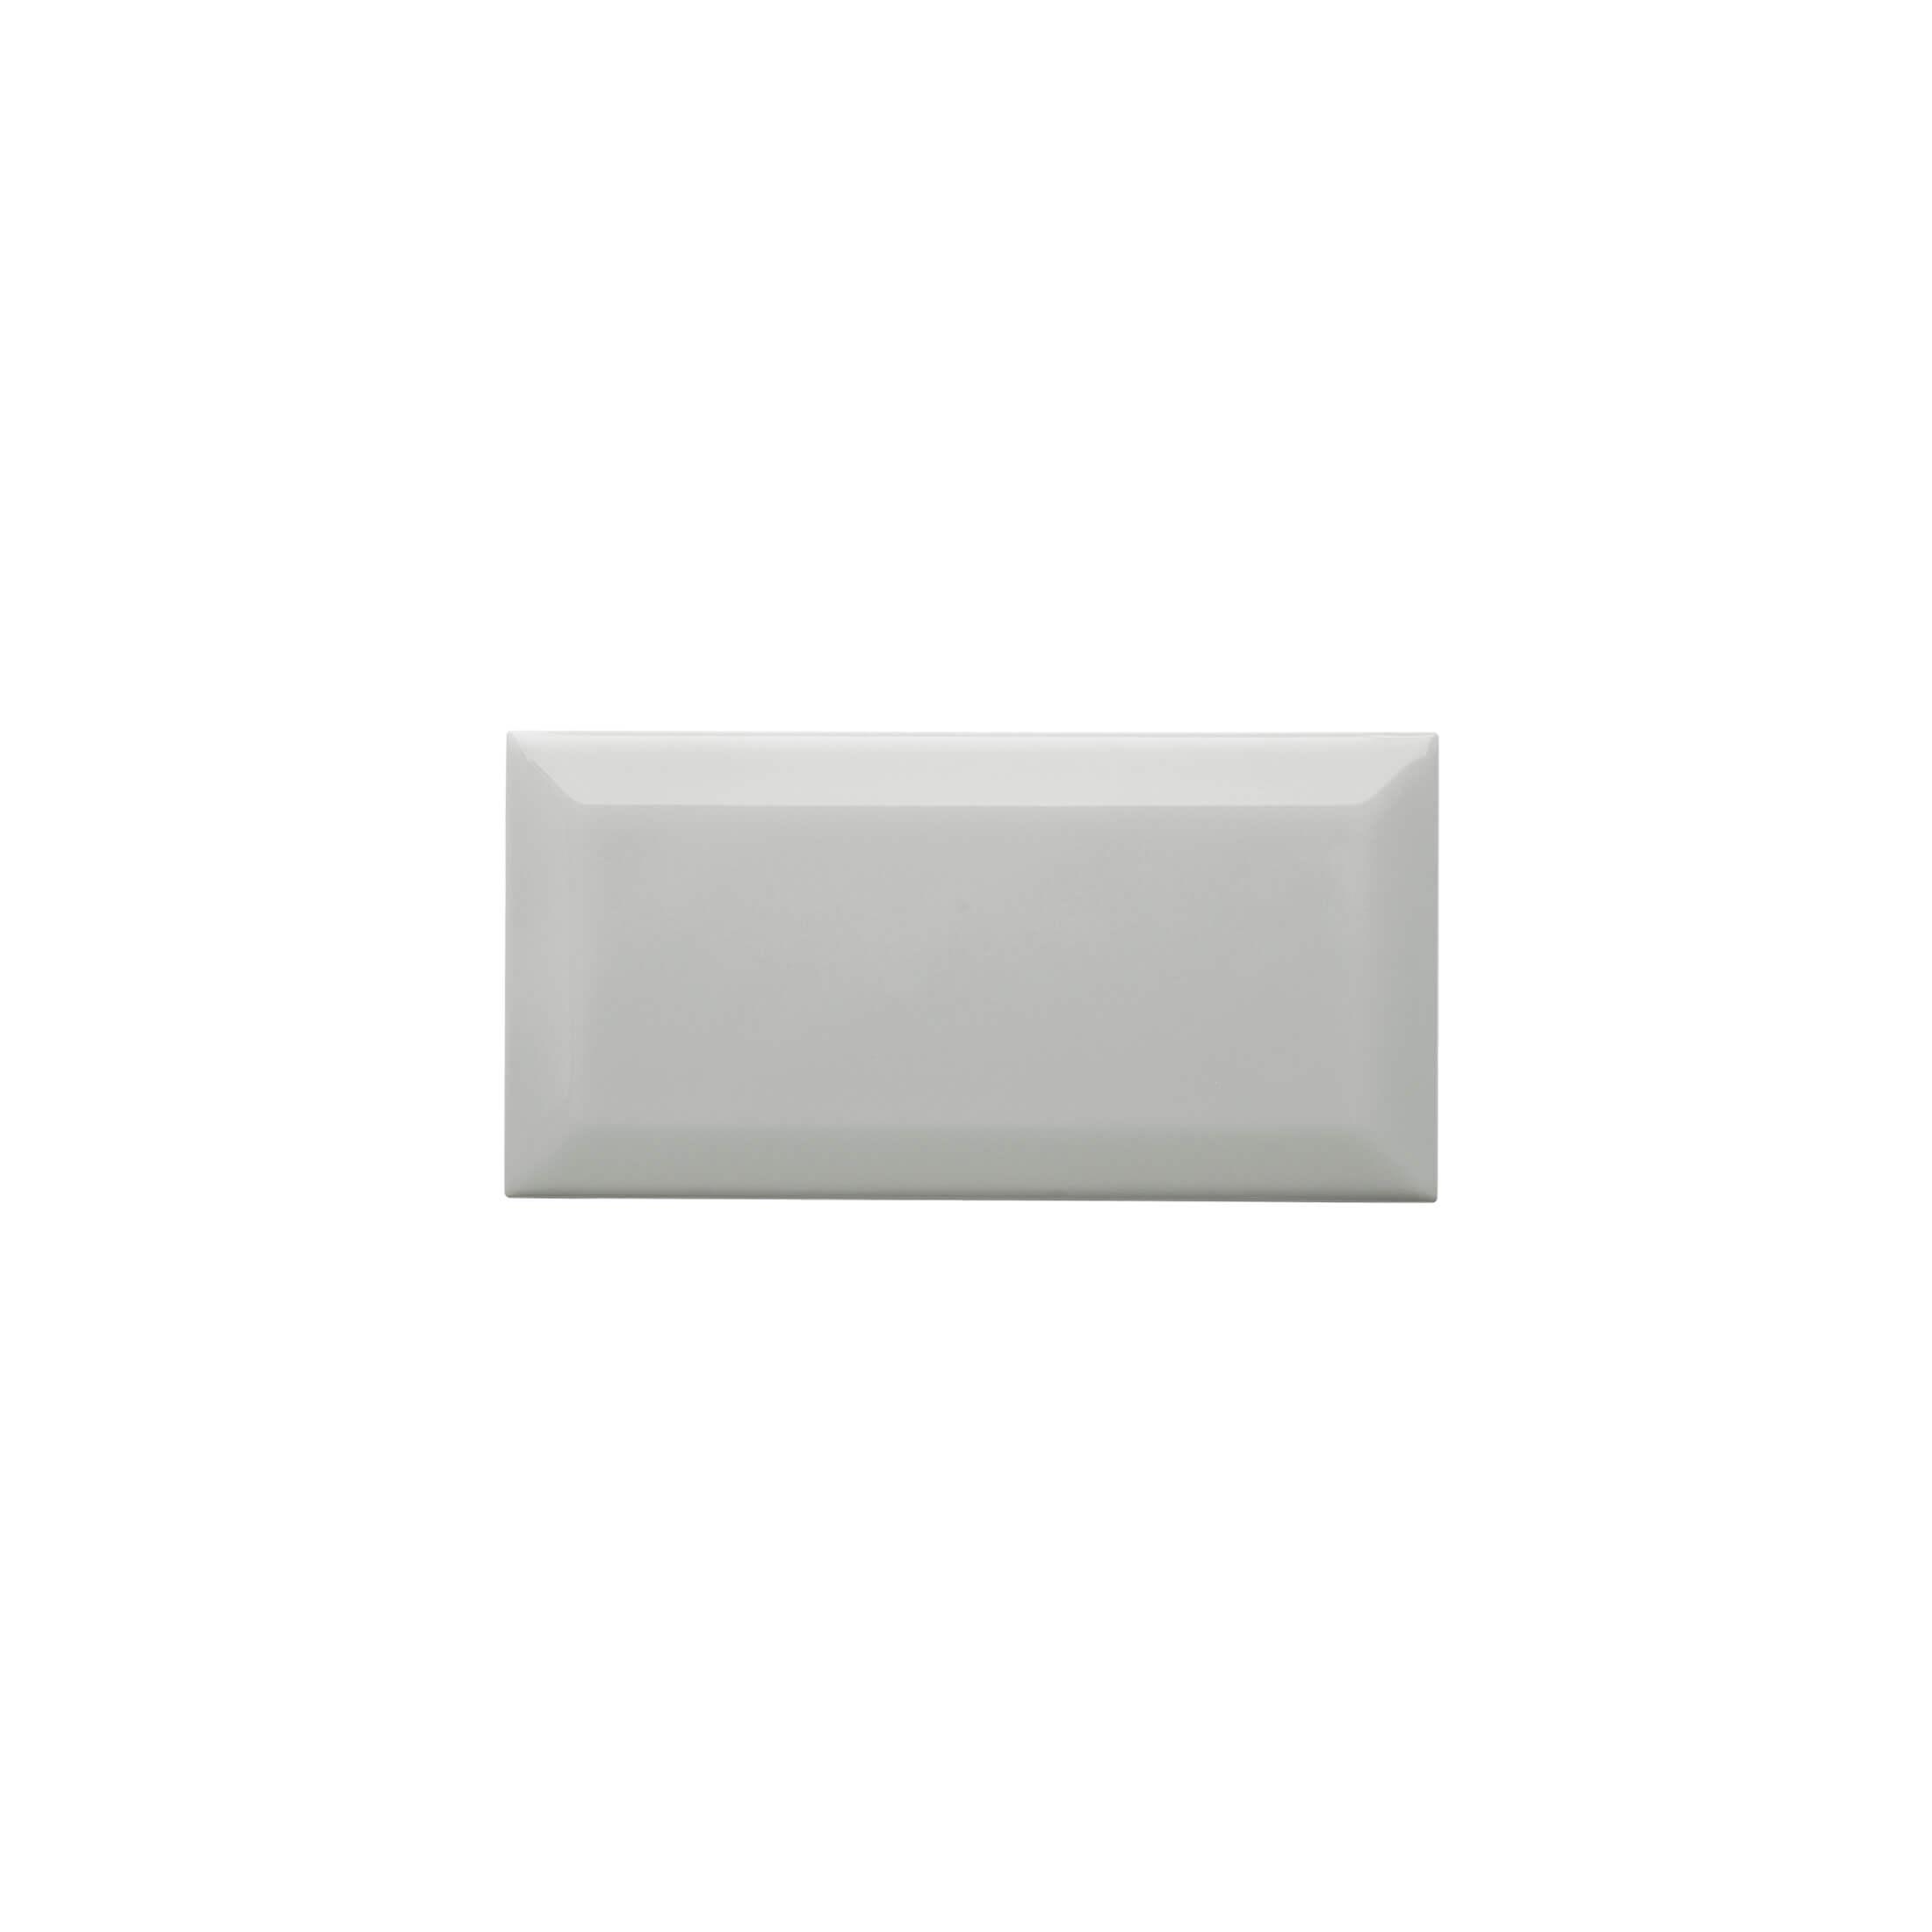 ADNE2050 - BISELADO PB - 7.5 cm X 15 cm